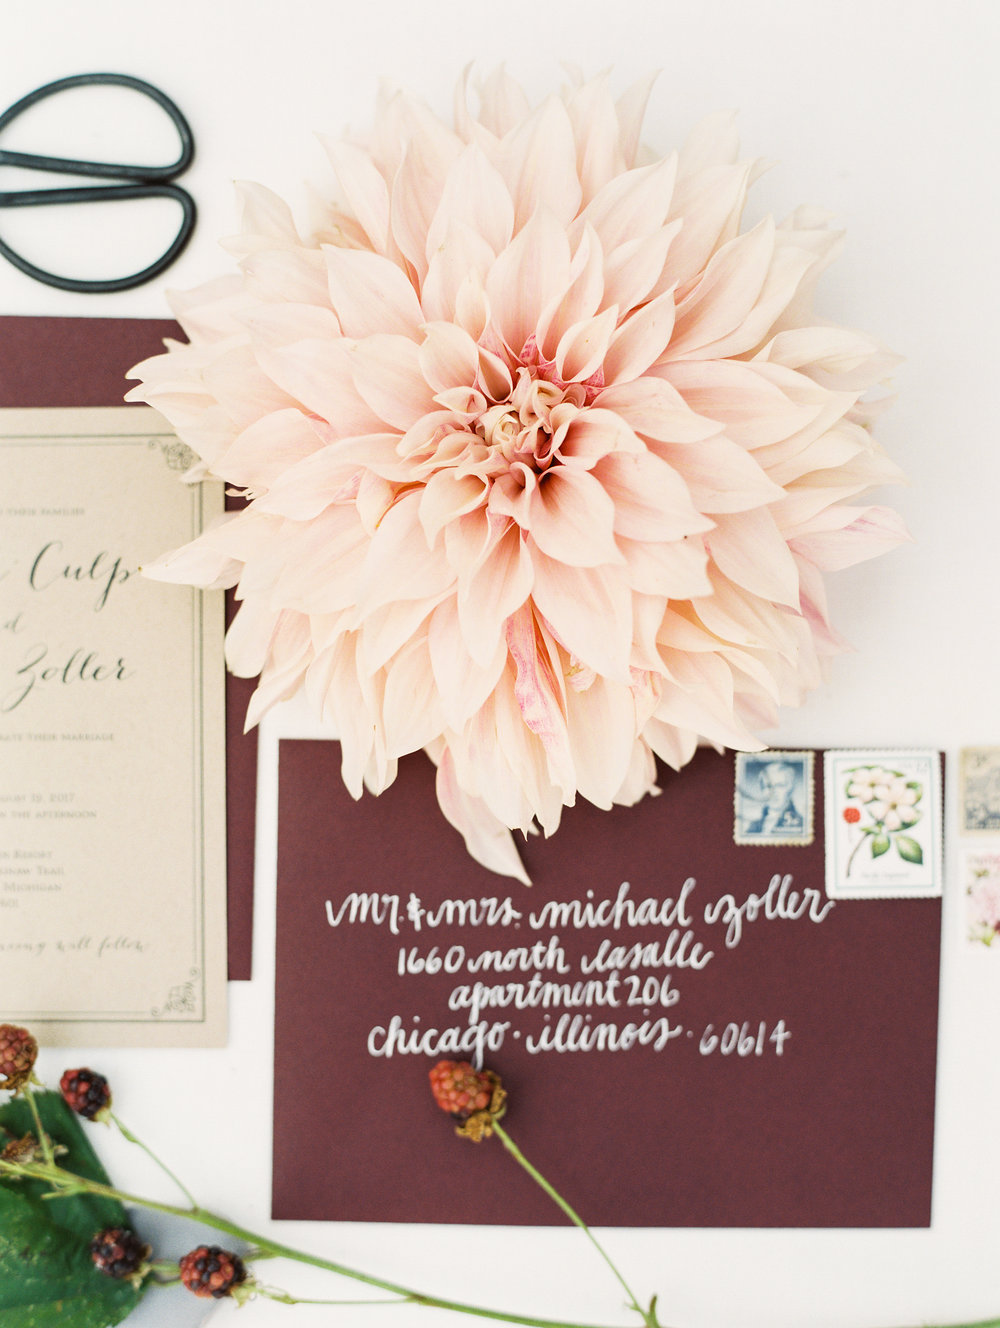 Zoller+Wedding+Details-2.jpg